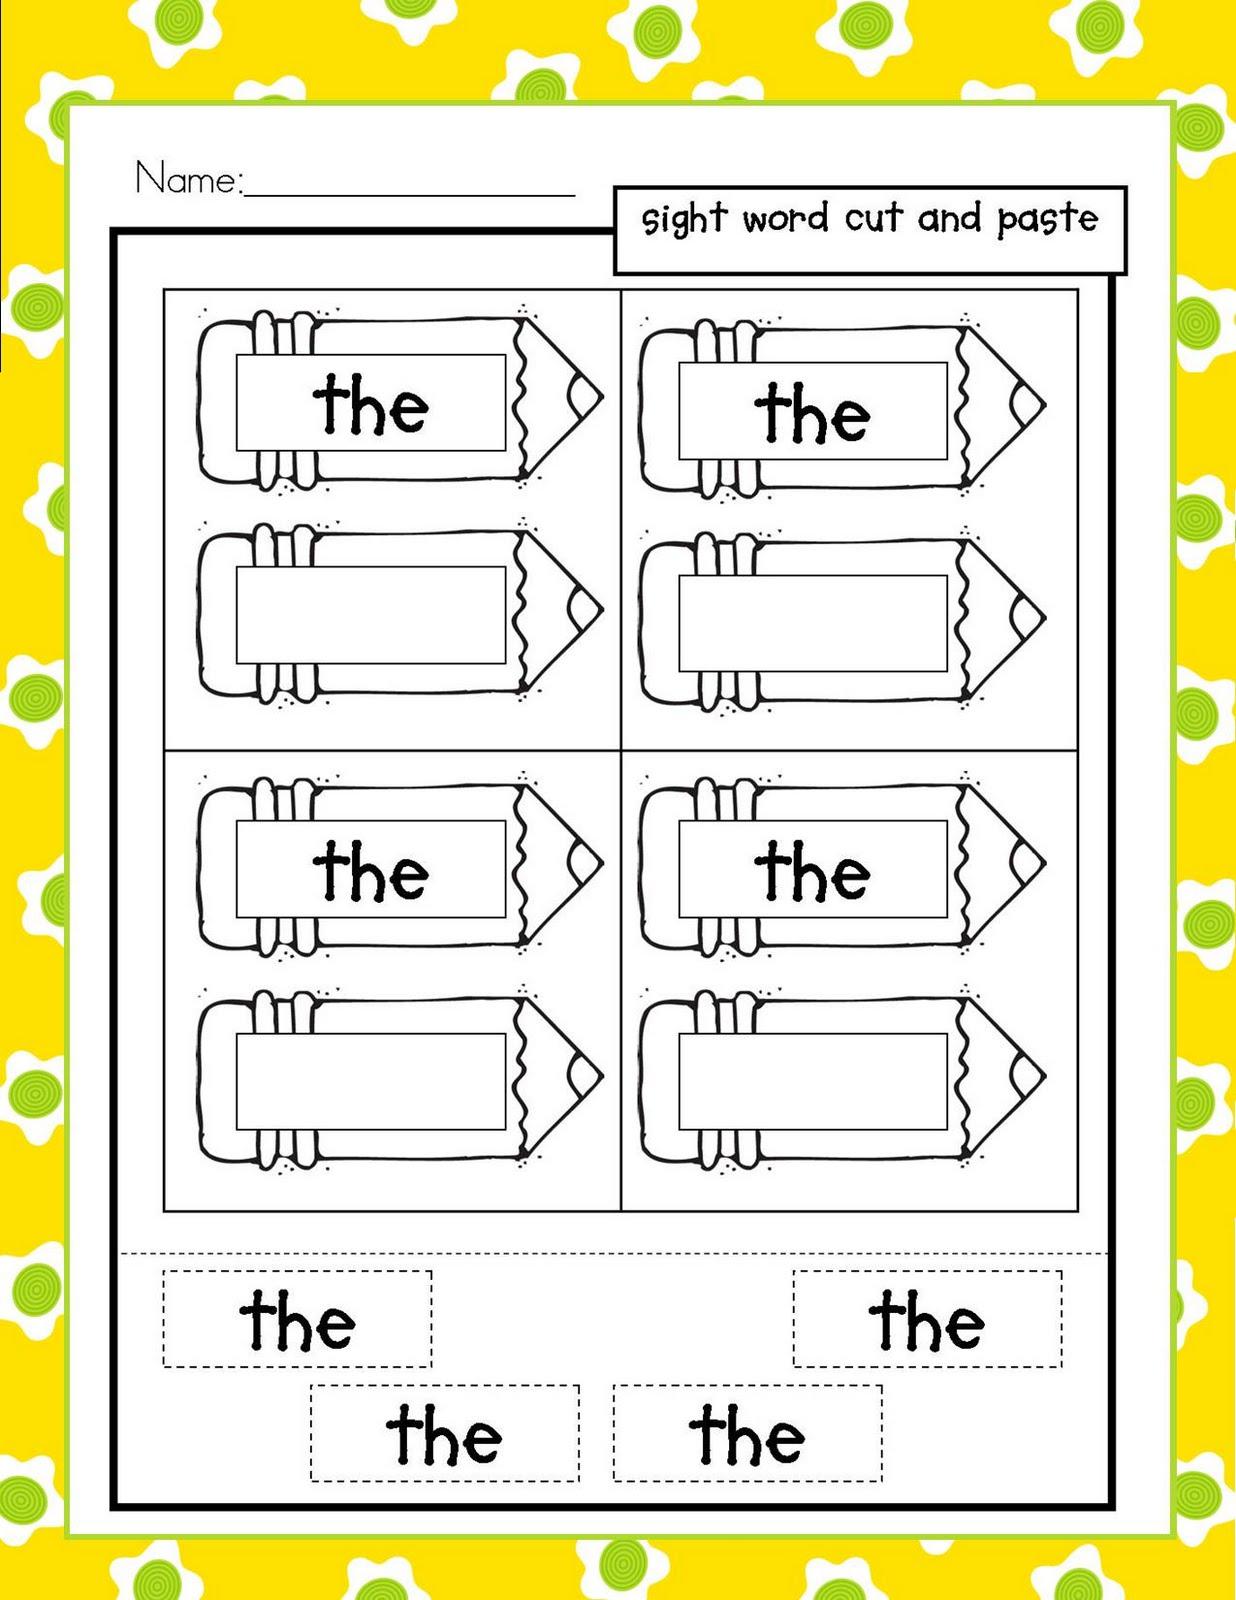 Kindergarten Sight Word Worksheets SightWordsGamecom